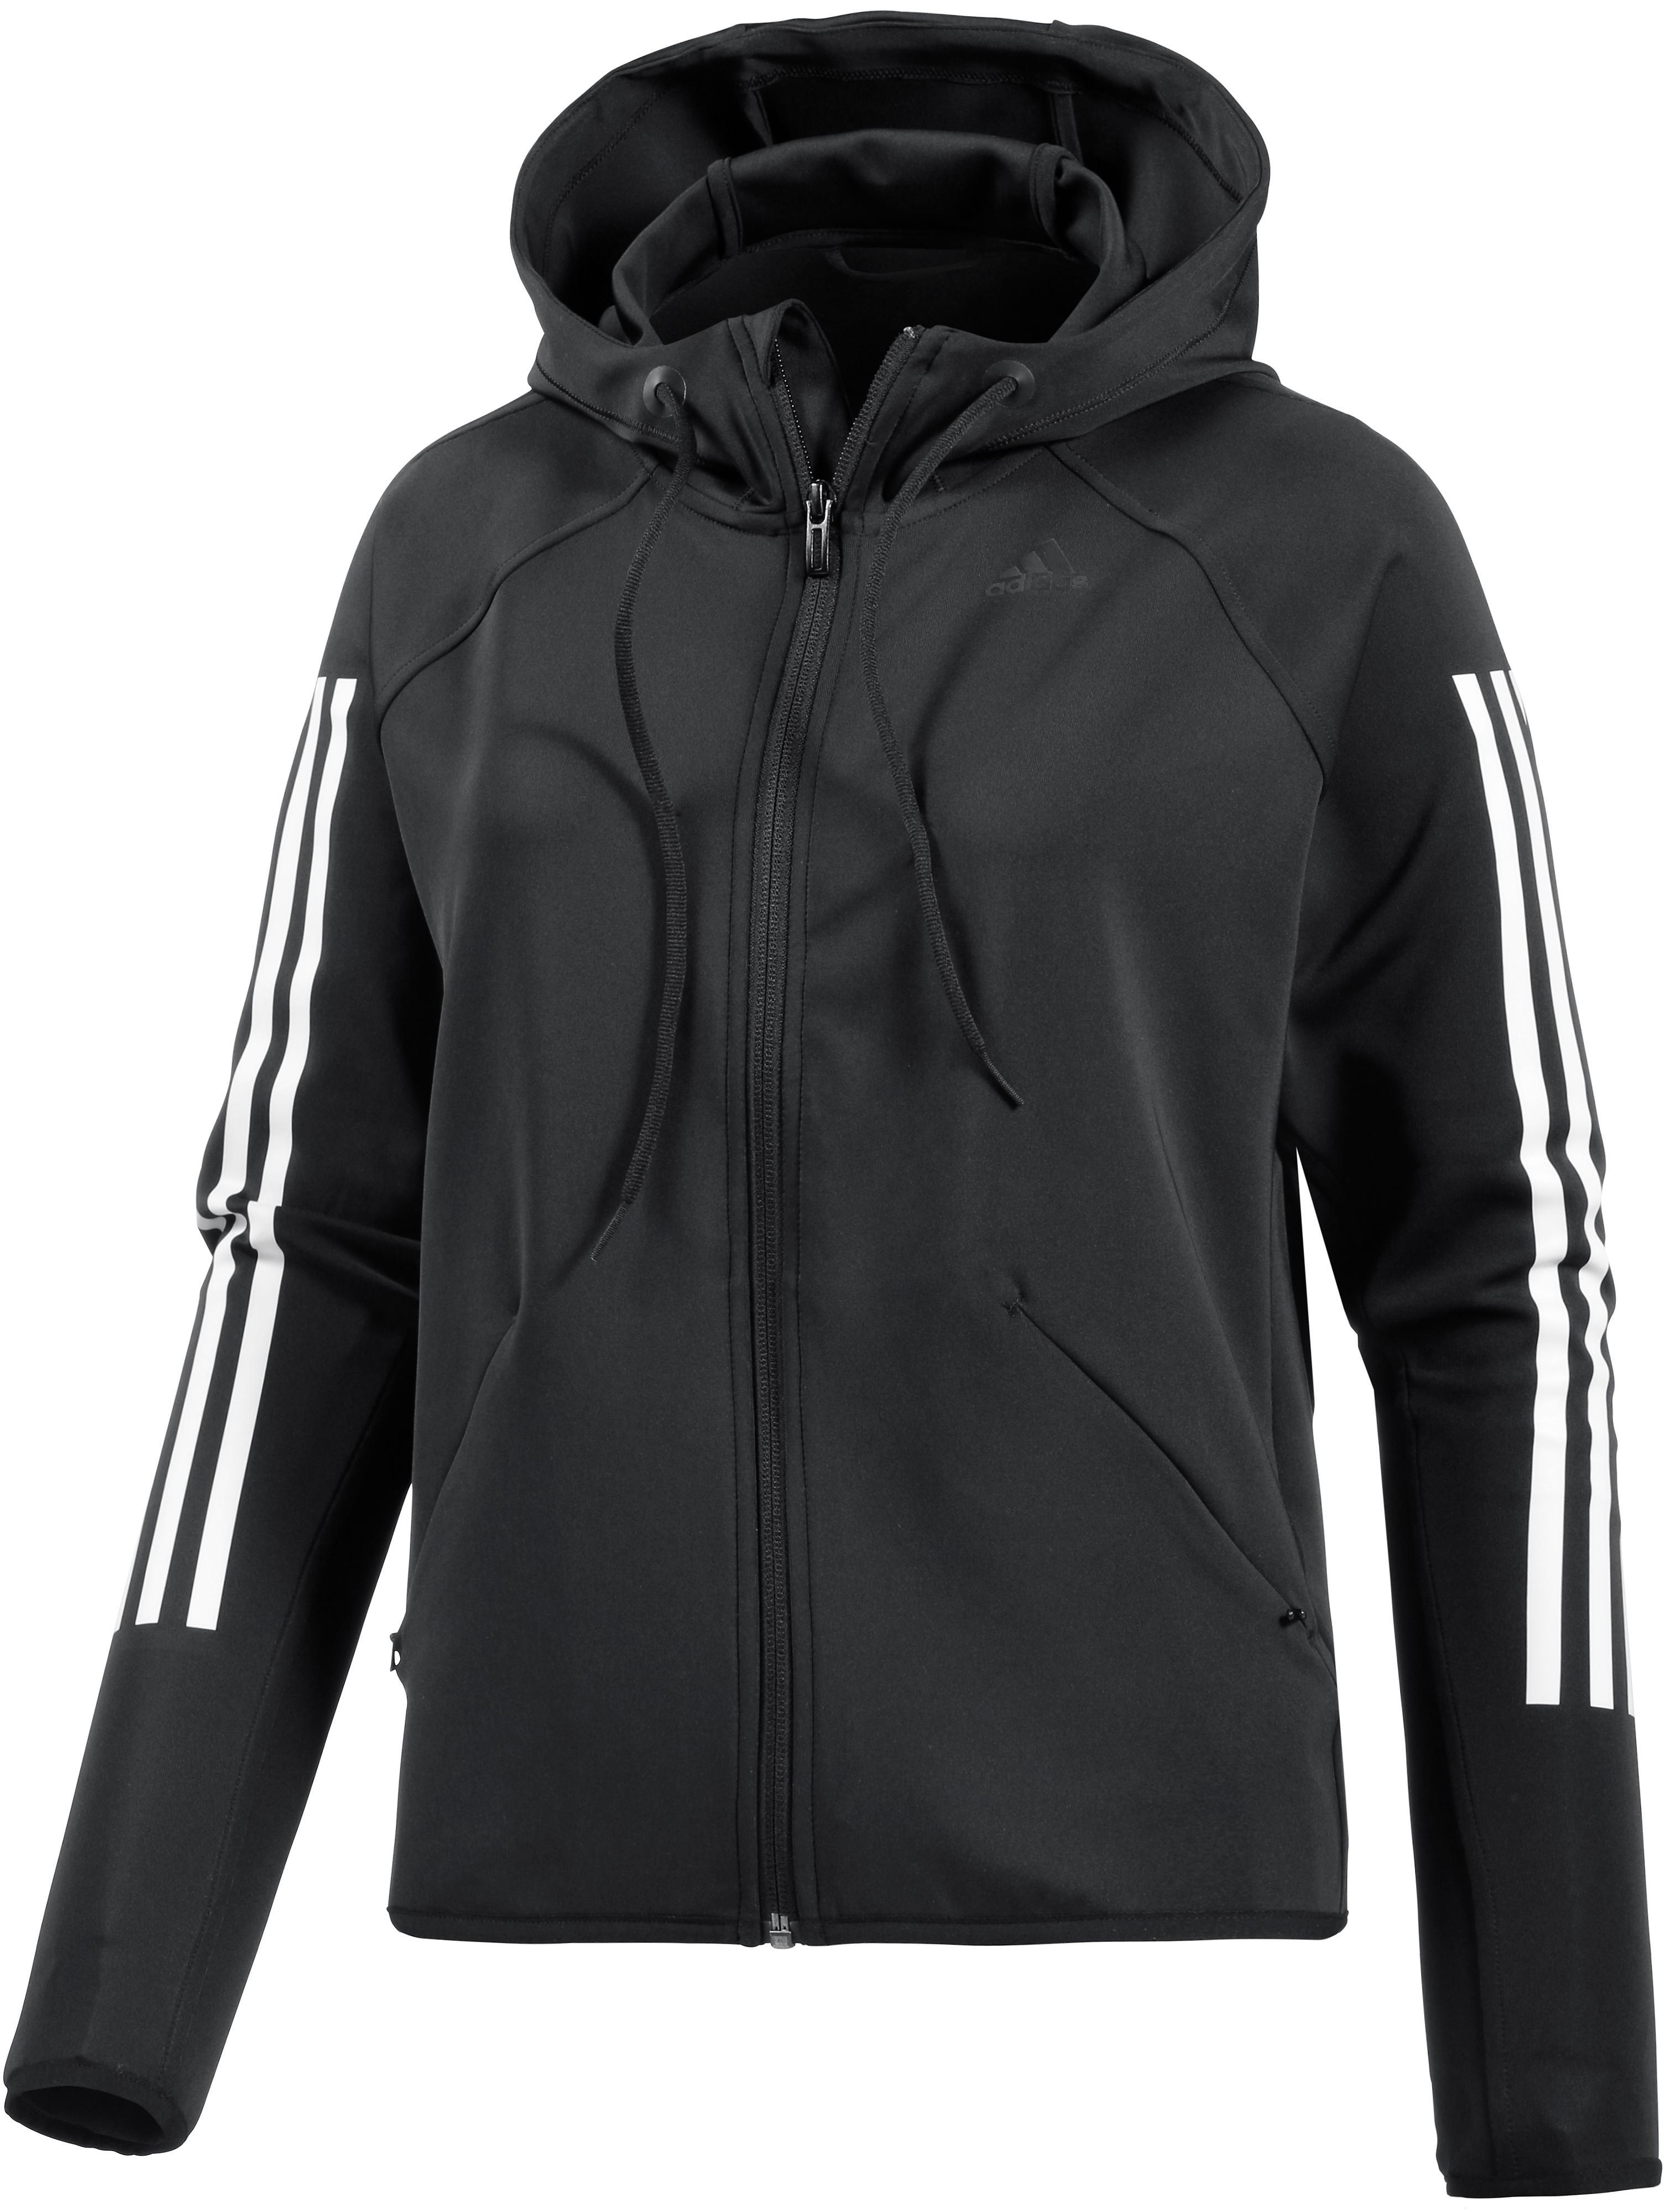 Adidas jacke damen weis schwarz